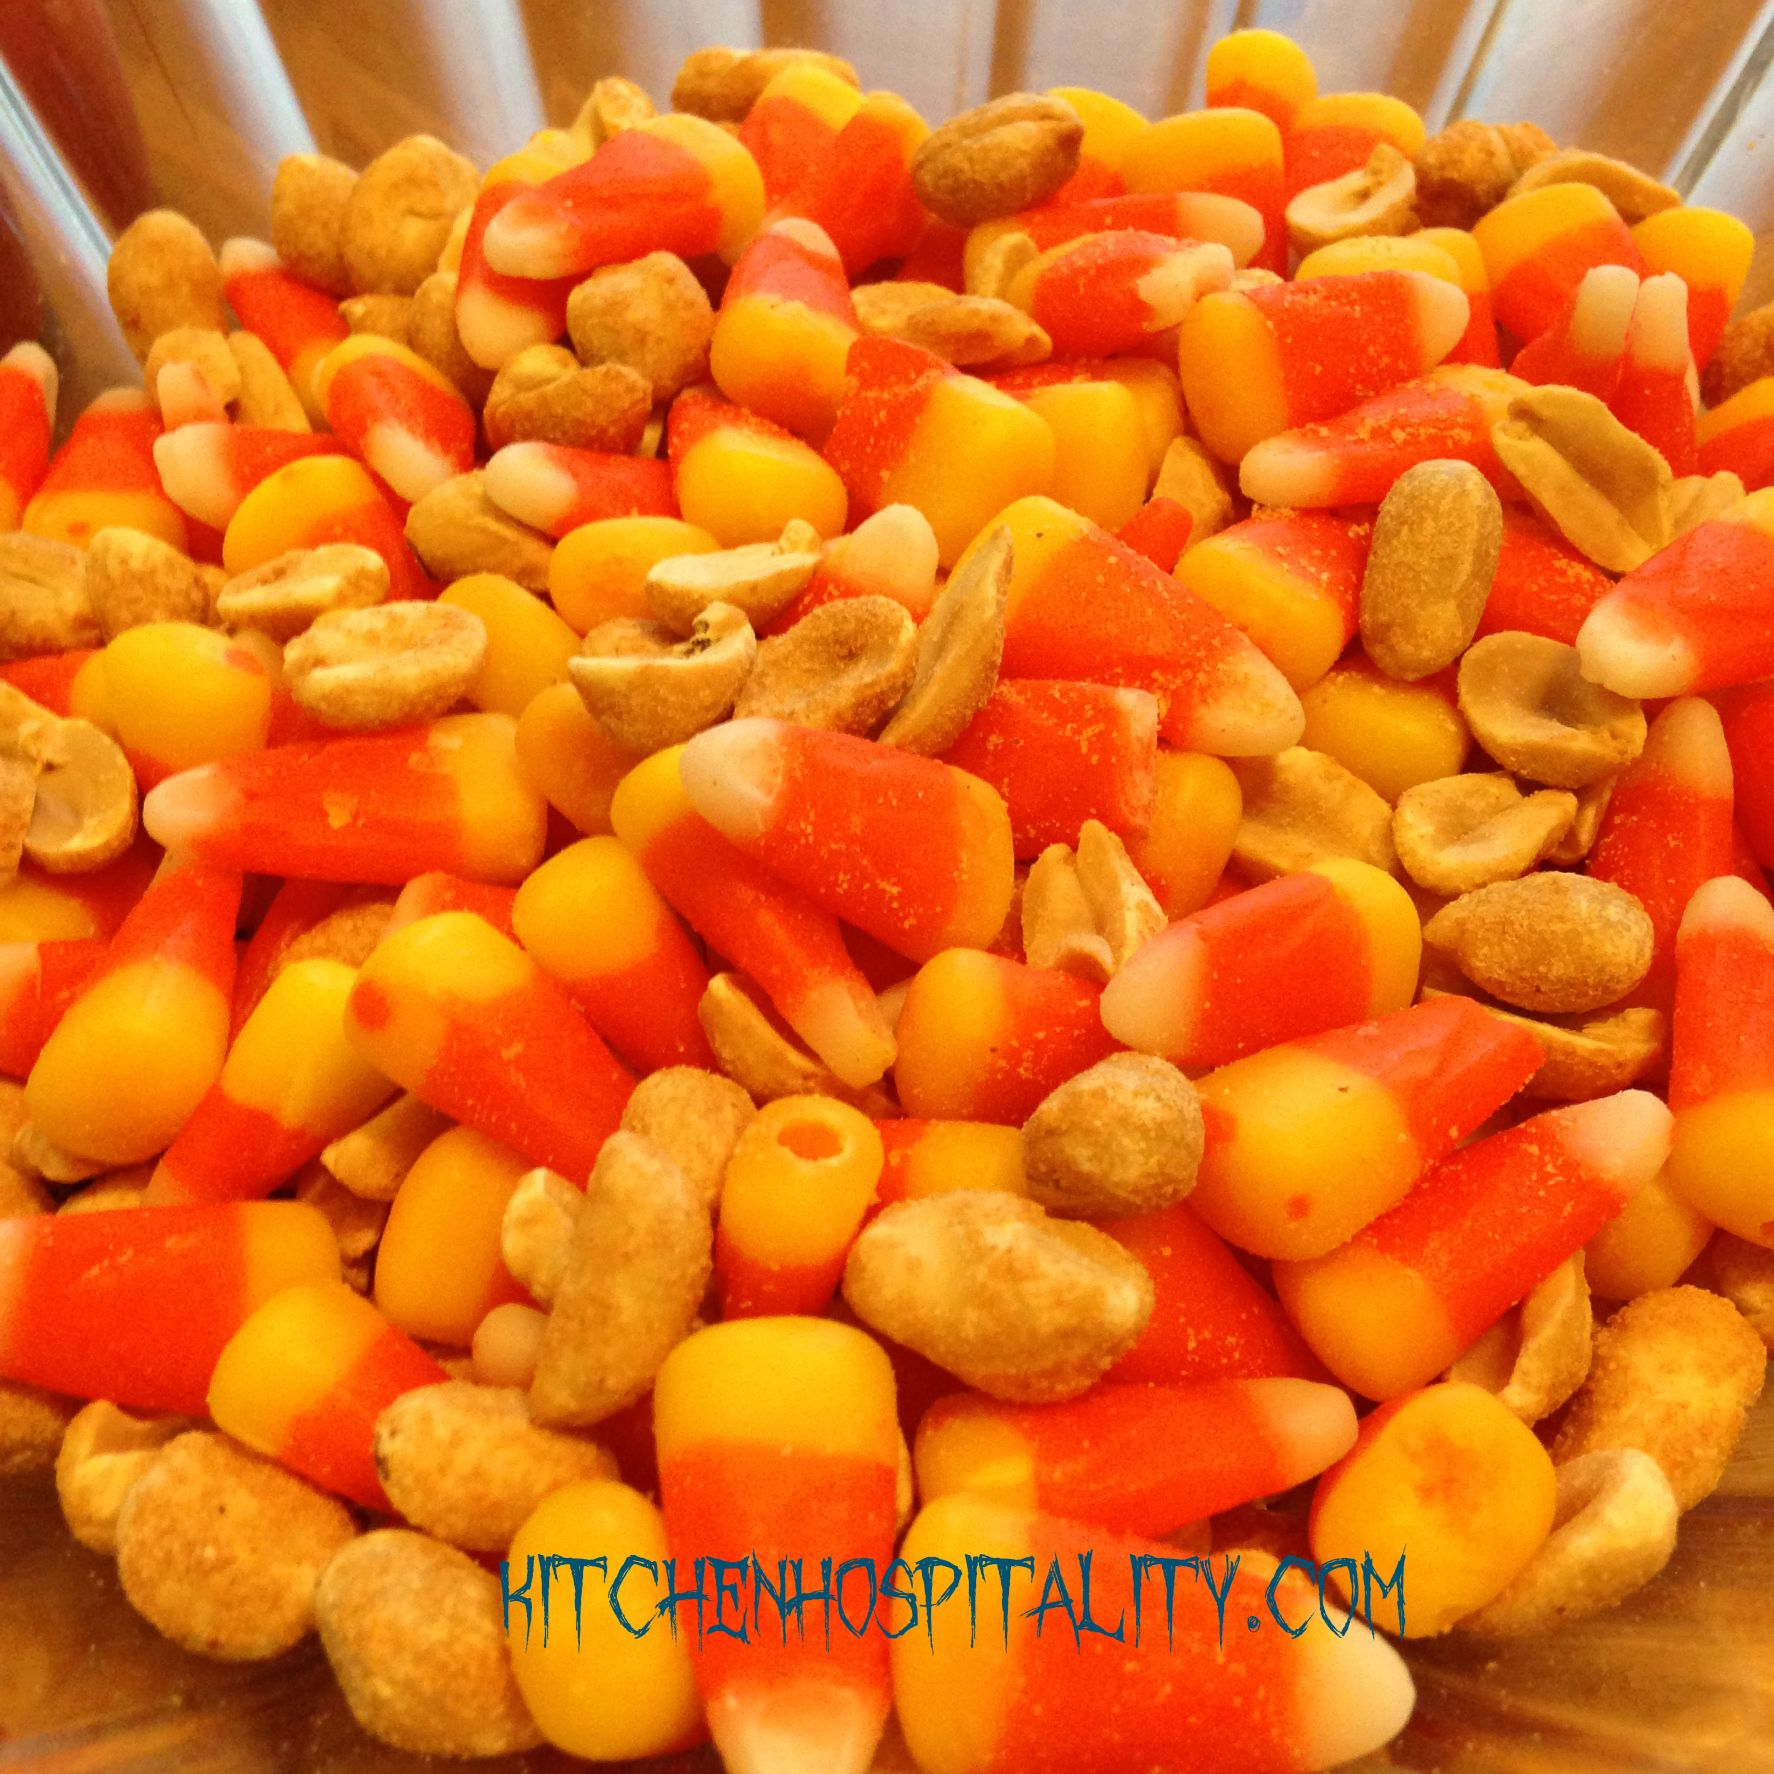 Candy Corn & Peanuts Medley